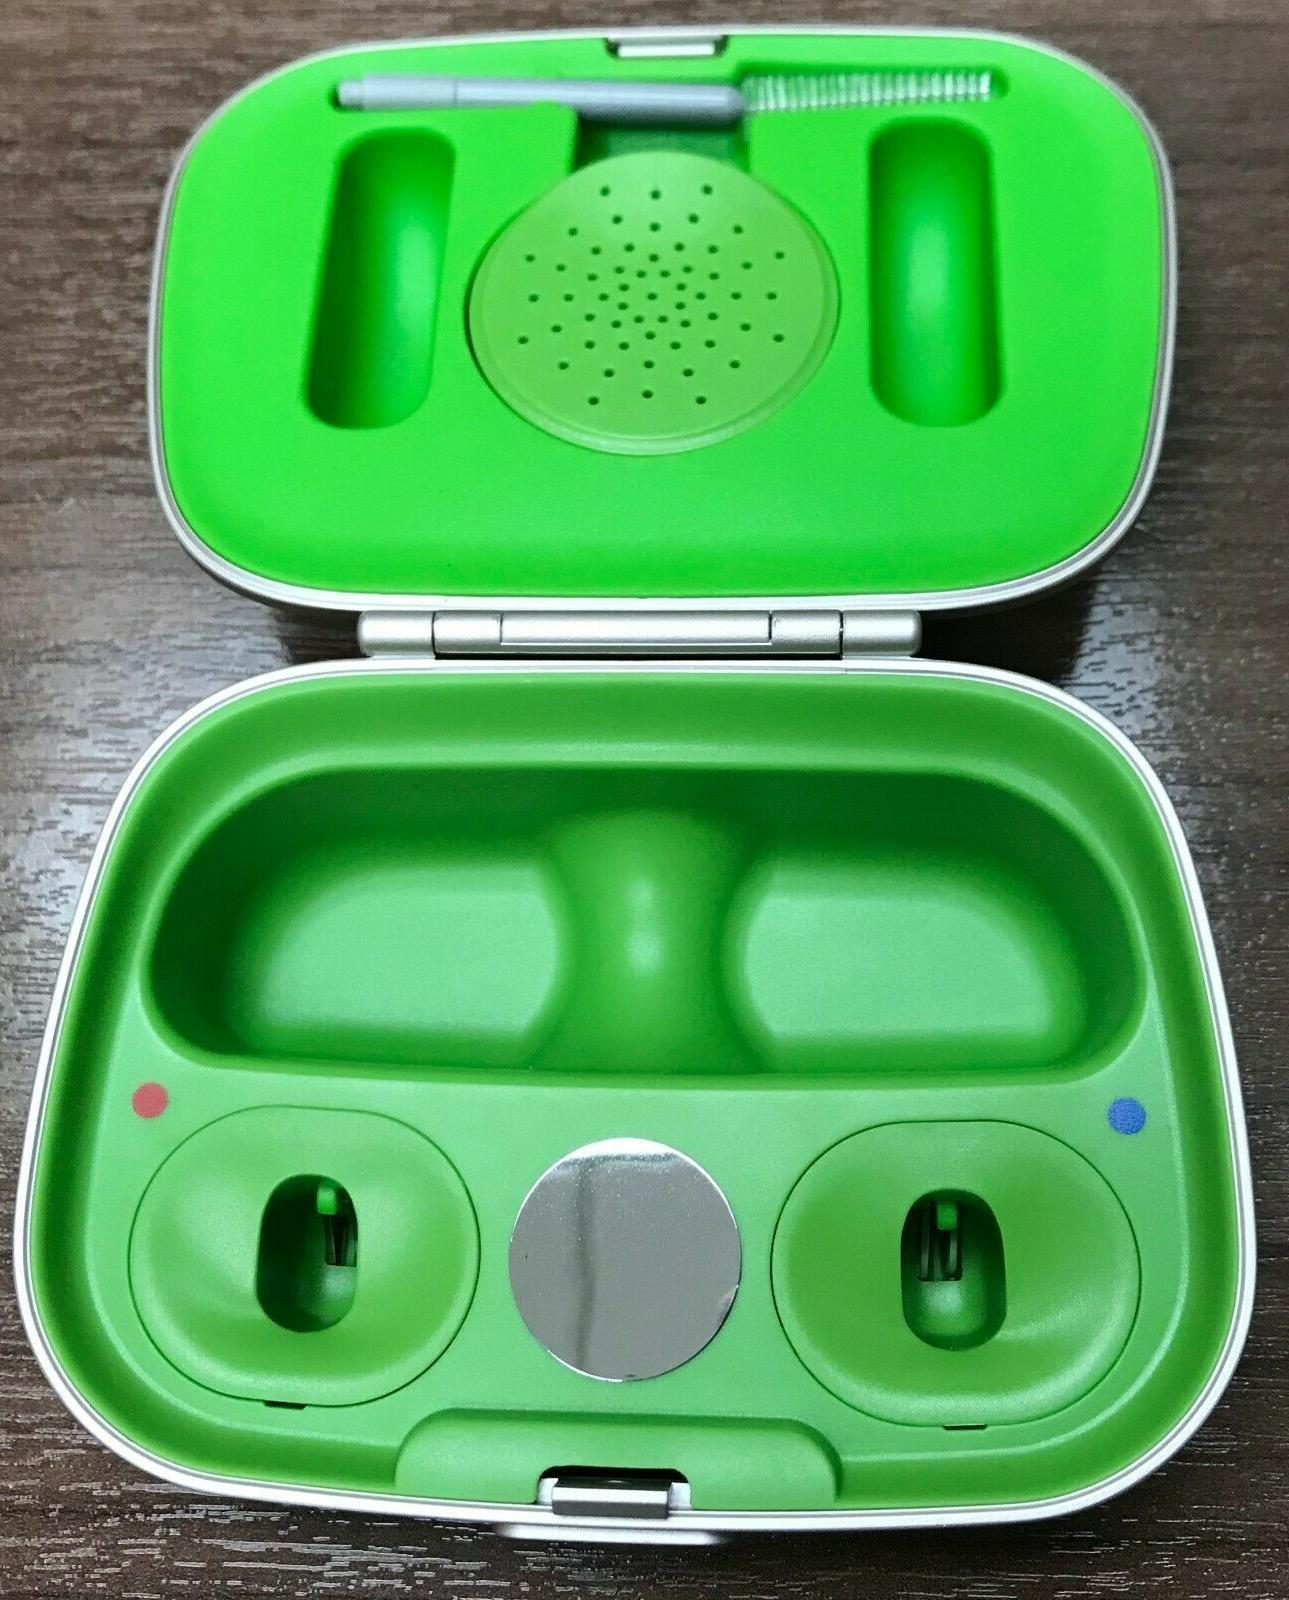 audeo belong ric hearing aid charger charging